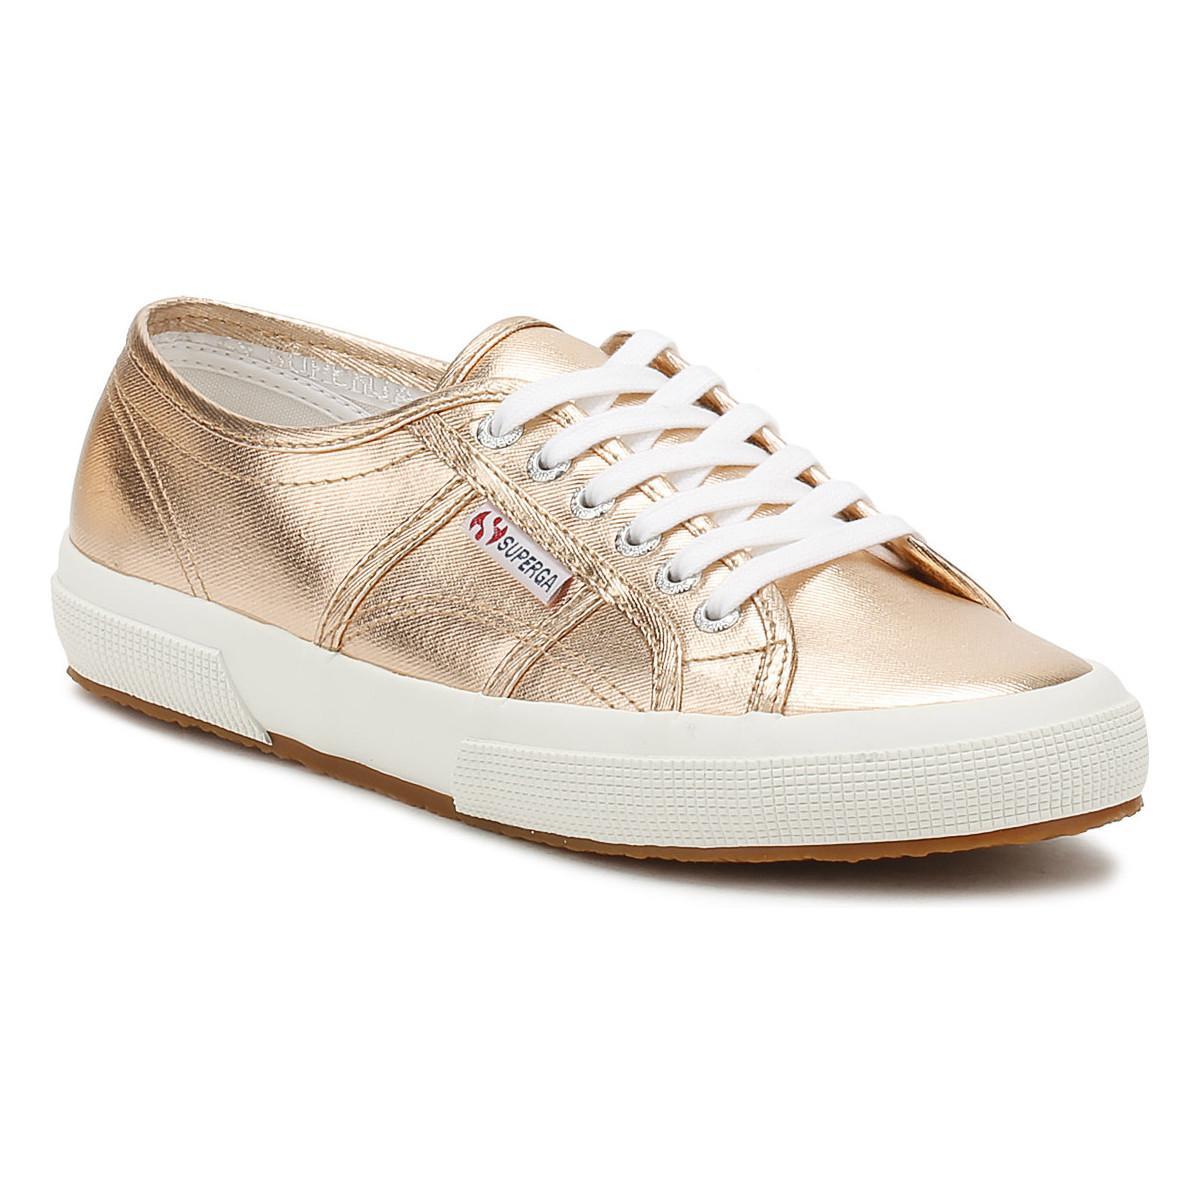 392b893dfd04 Superga - Metallic Womens Rose Gold 2750 Cotmetu Trainers Women s Shoes  (trainers) In Gold. View fullscreen